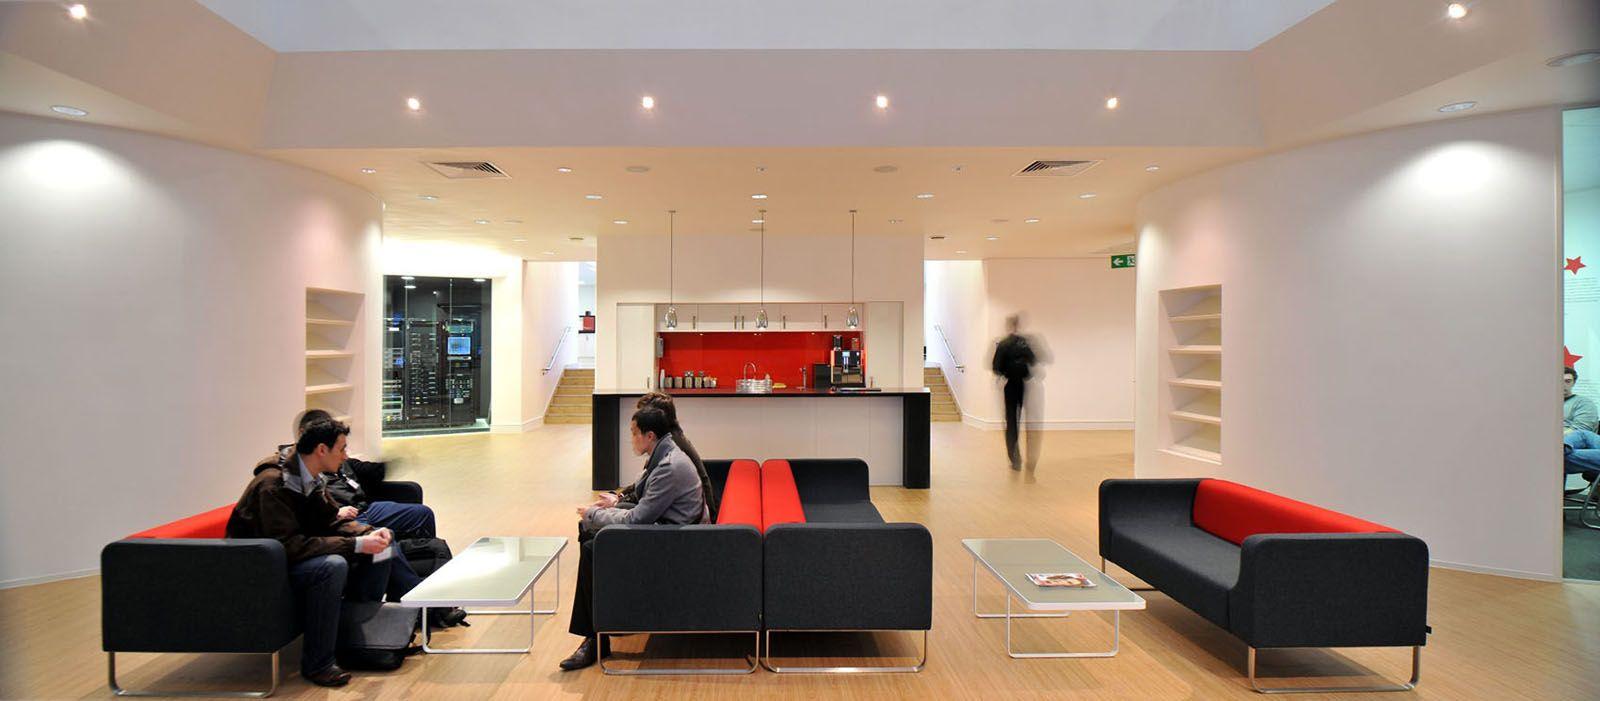 Rackspace office interior design 26